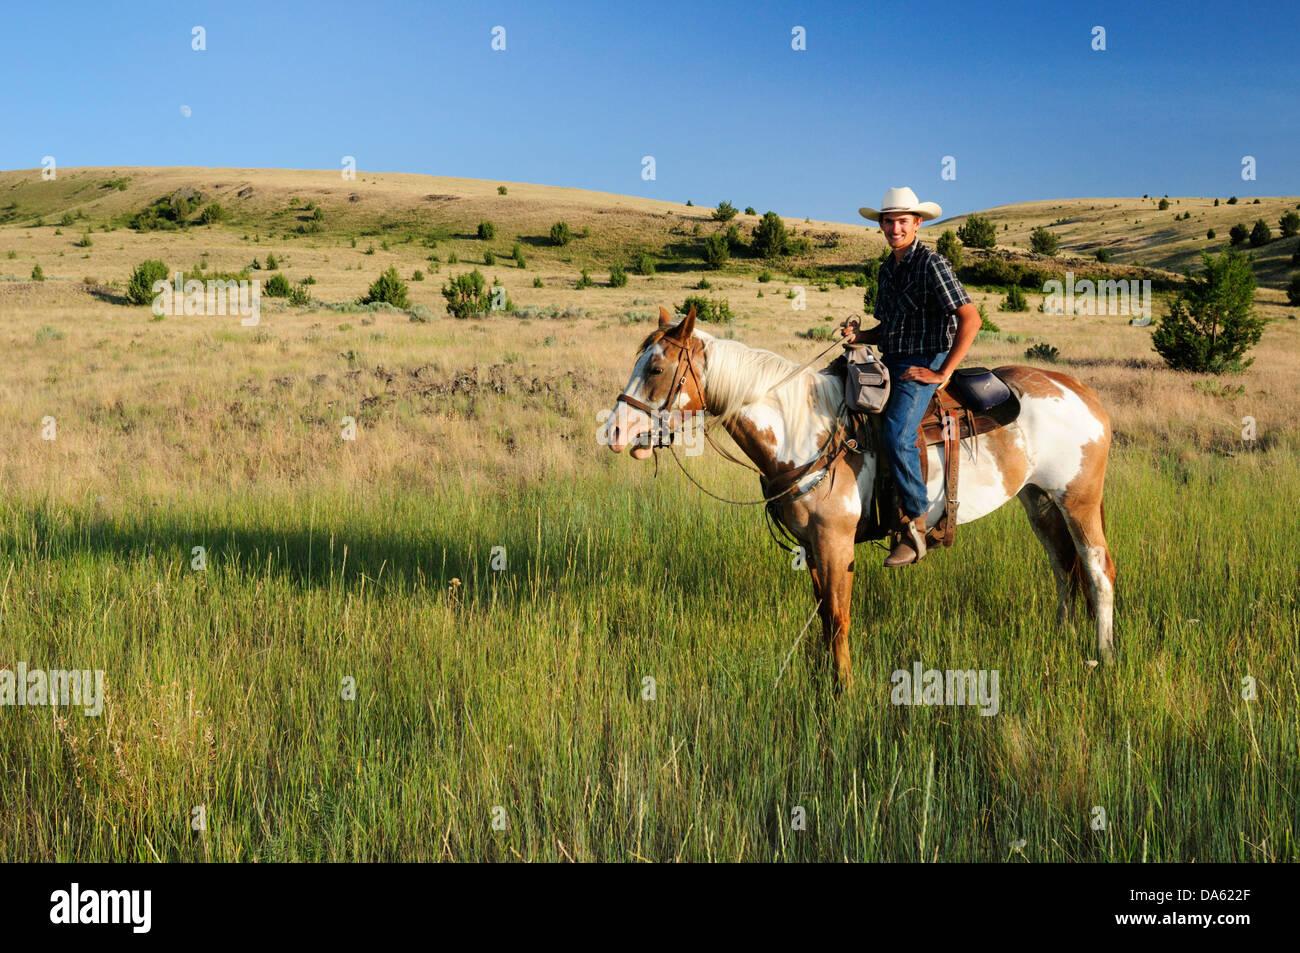 Pacific Northwest, Oregon, USA, United States, America, riding, horseback, sport, horse, ranch, cowboy, grass, green - Stock Image